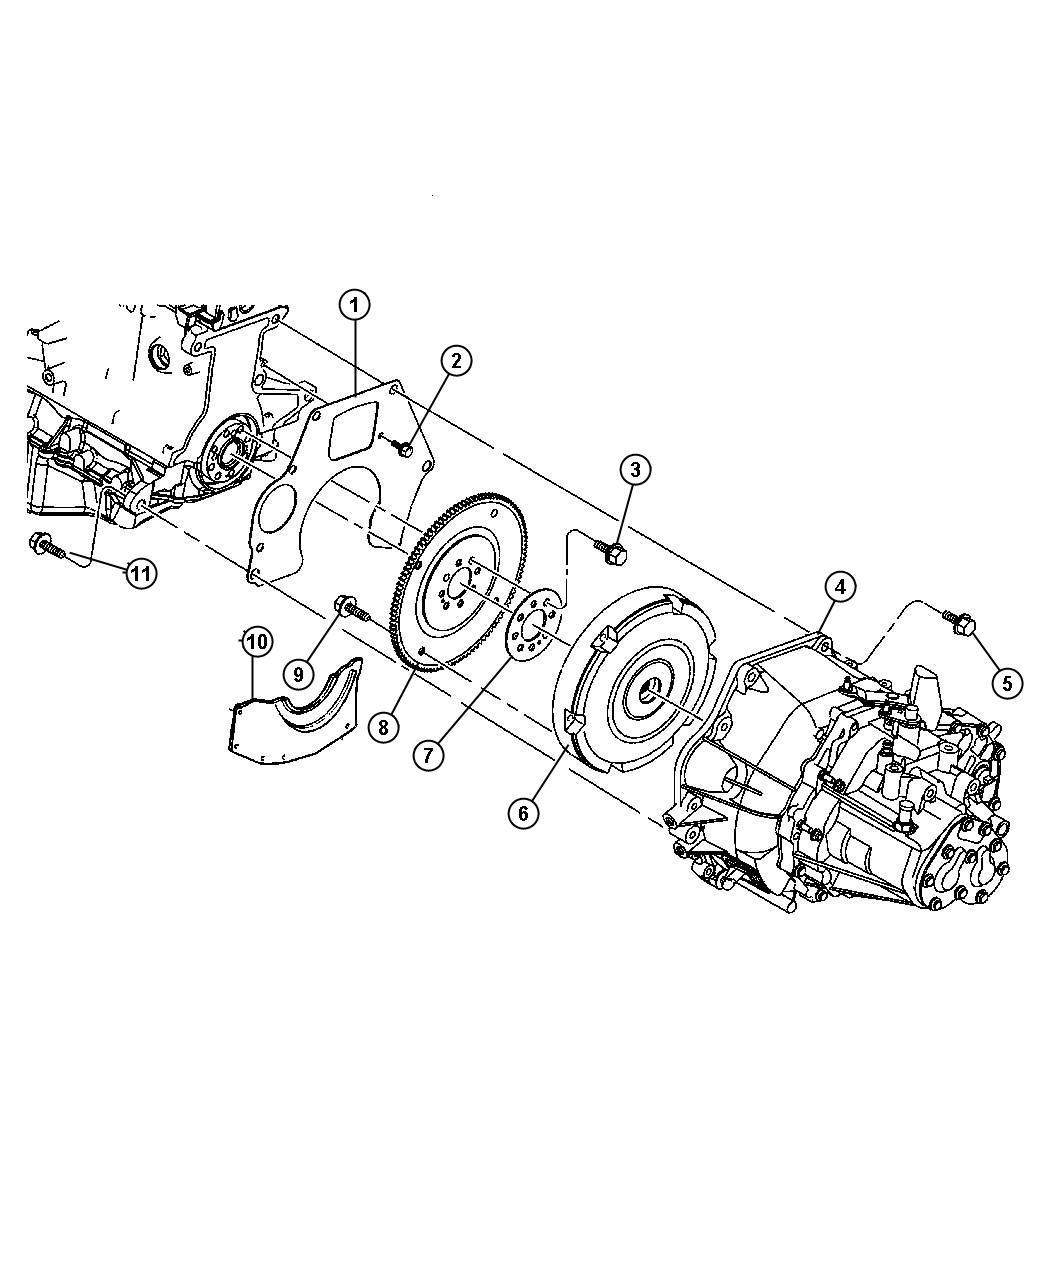 Chrysler Pt Cruiser Transaxle  Mounting  Overall  Gear